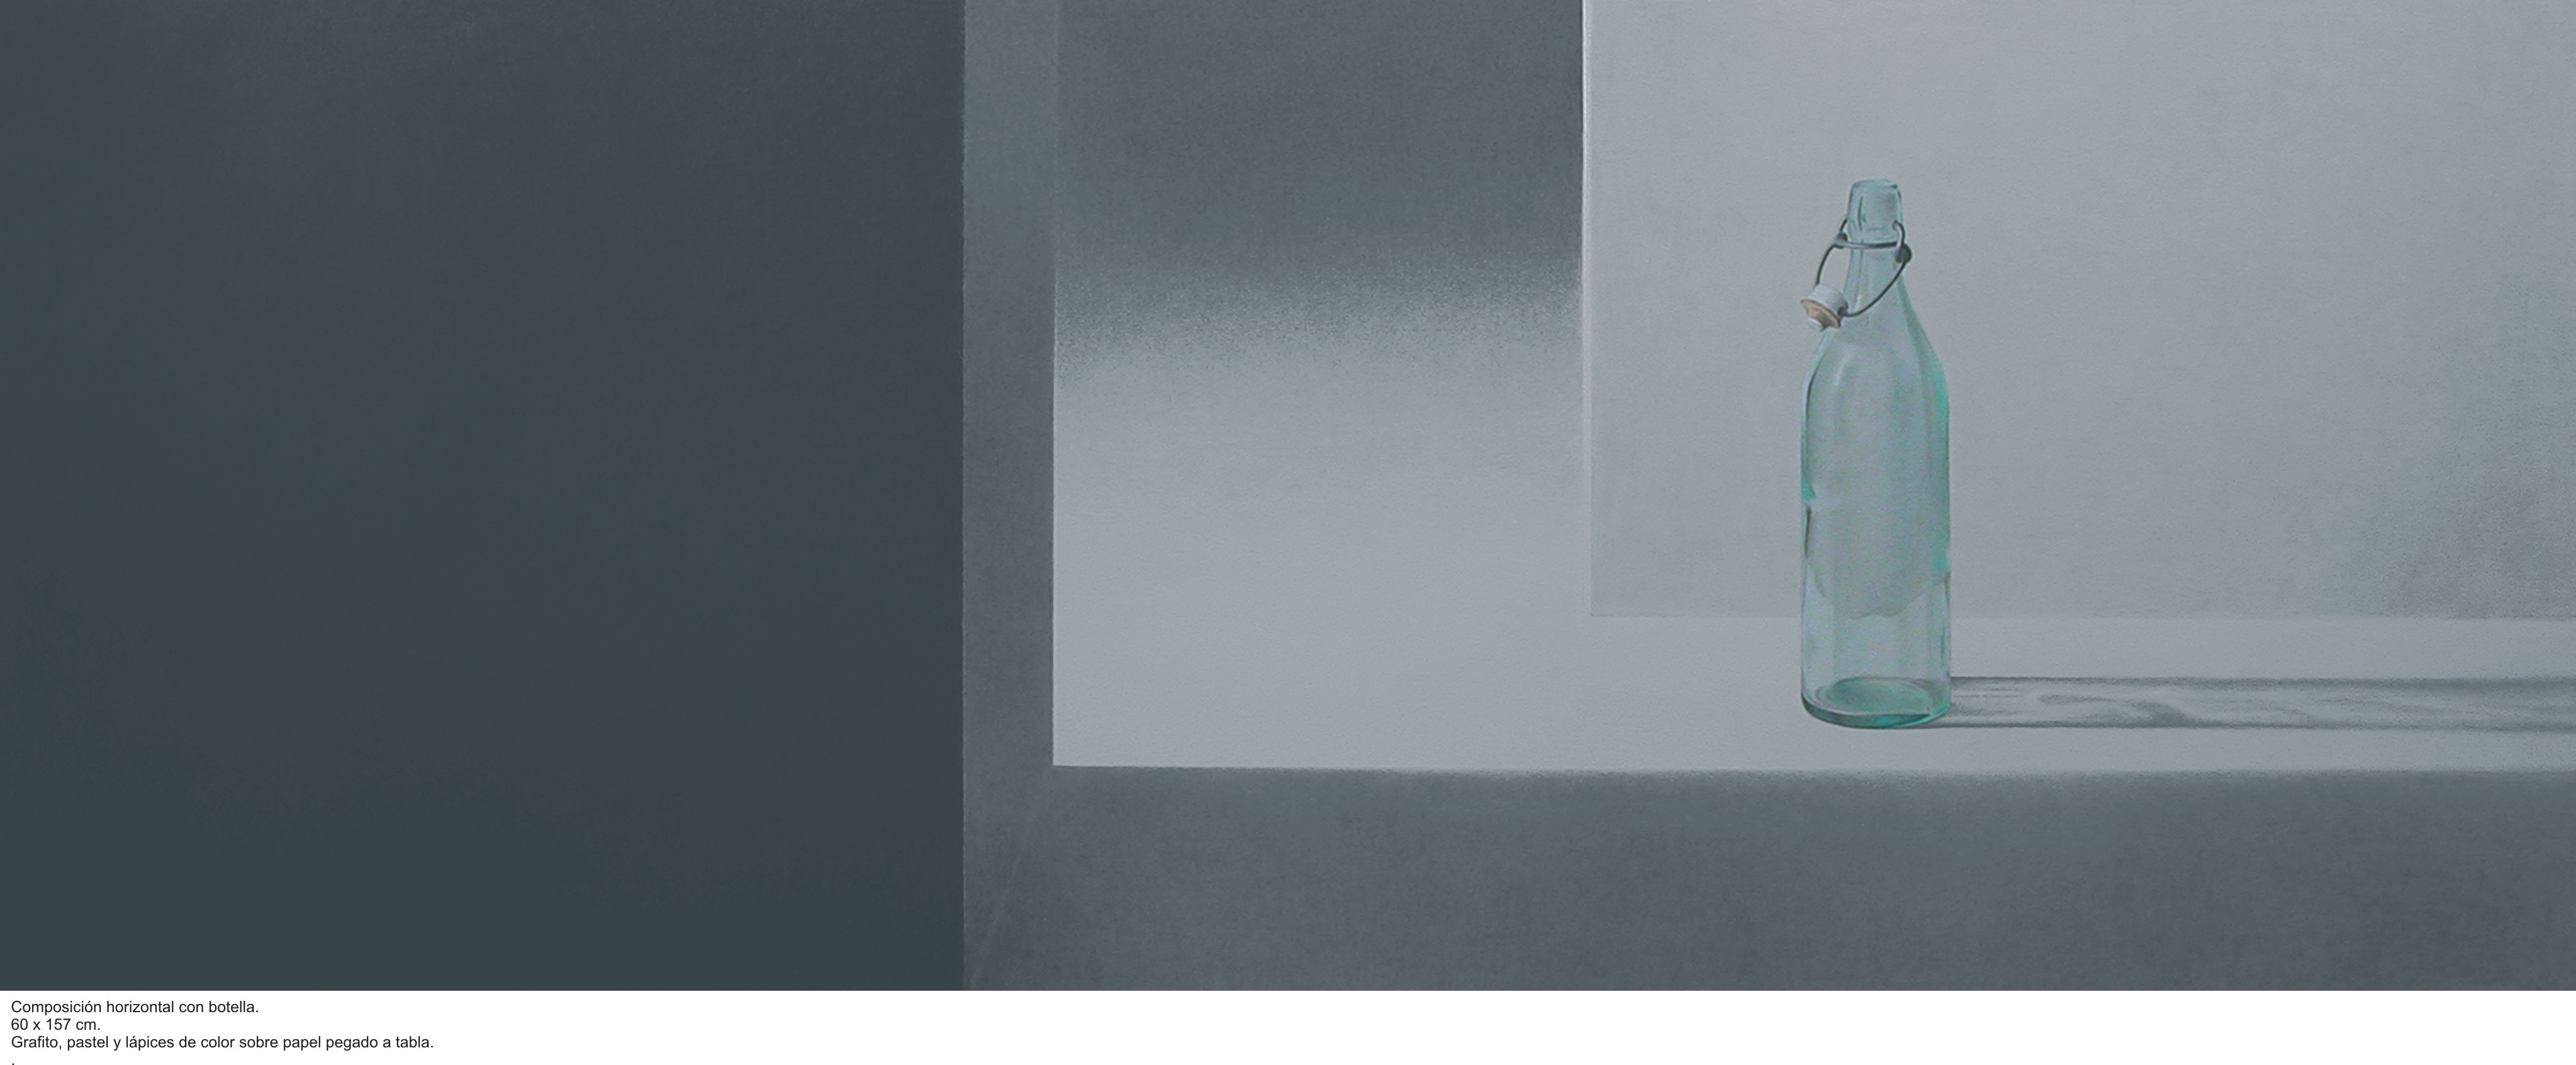 Composición horizontal con botella (2015) - Angel Luis Muñoz Durán